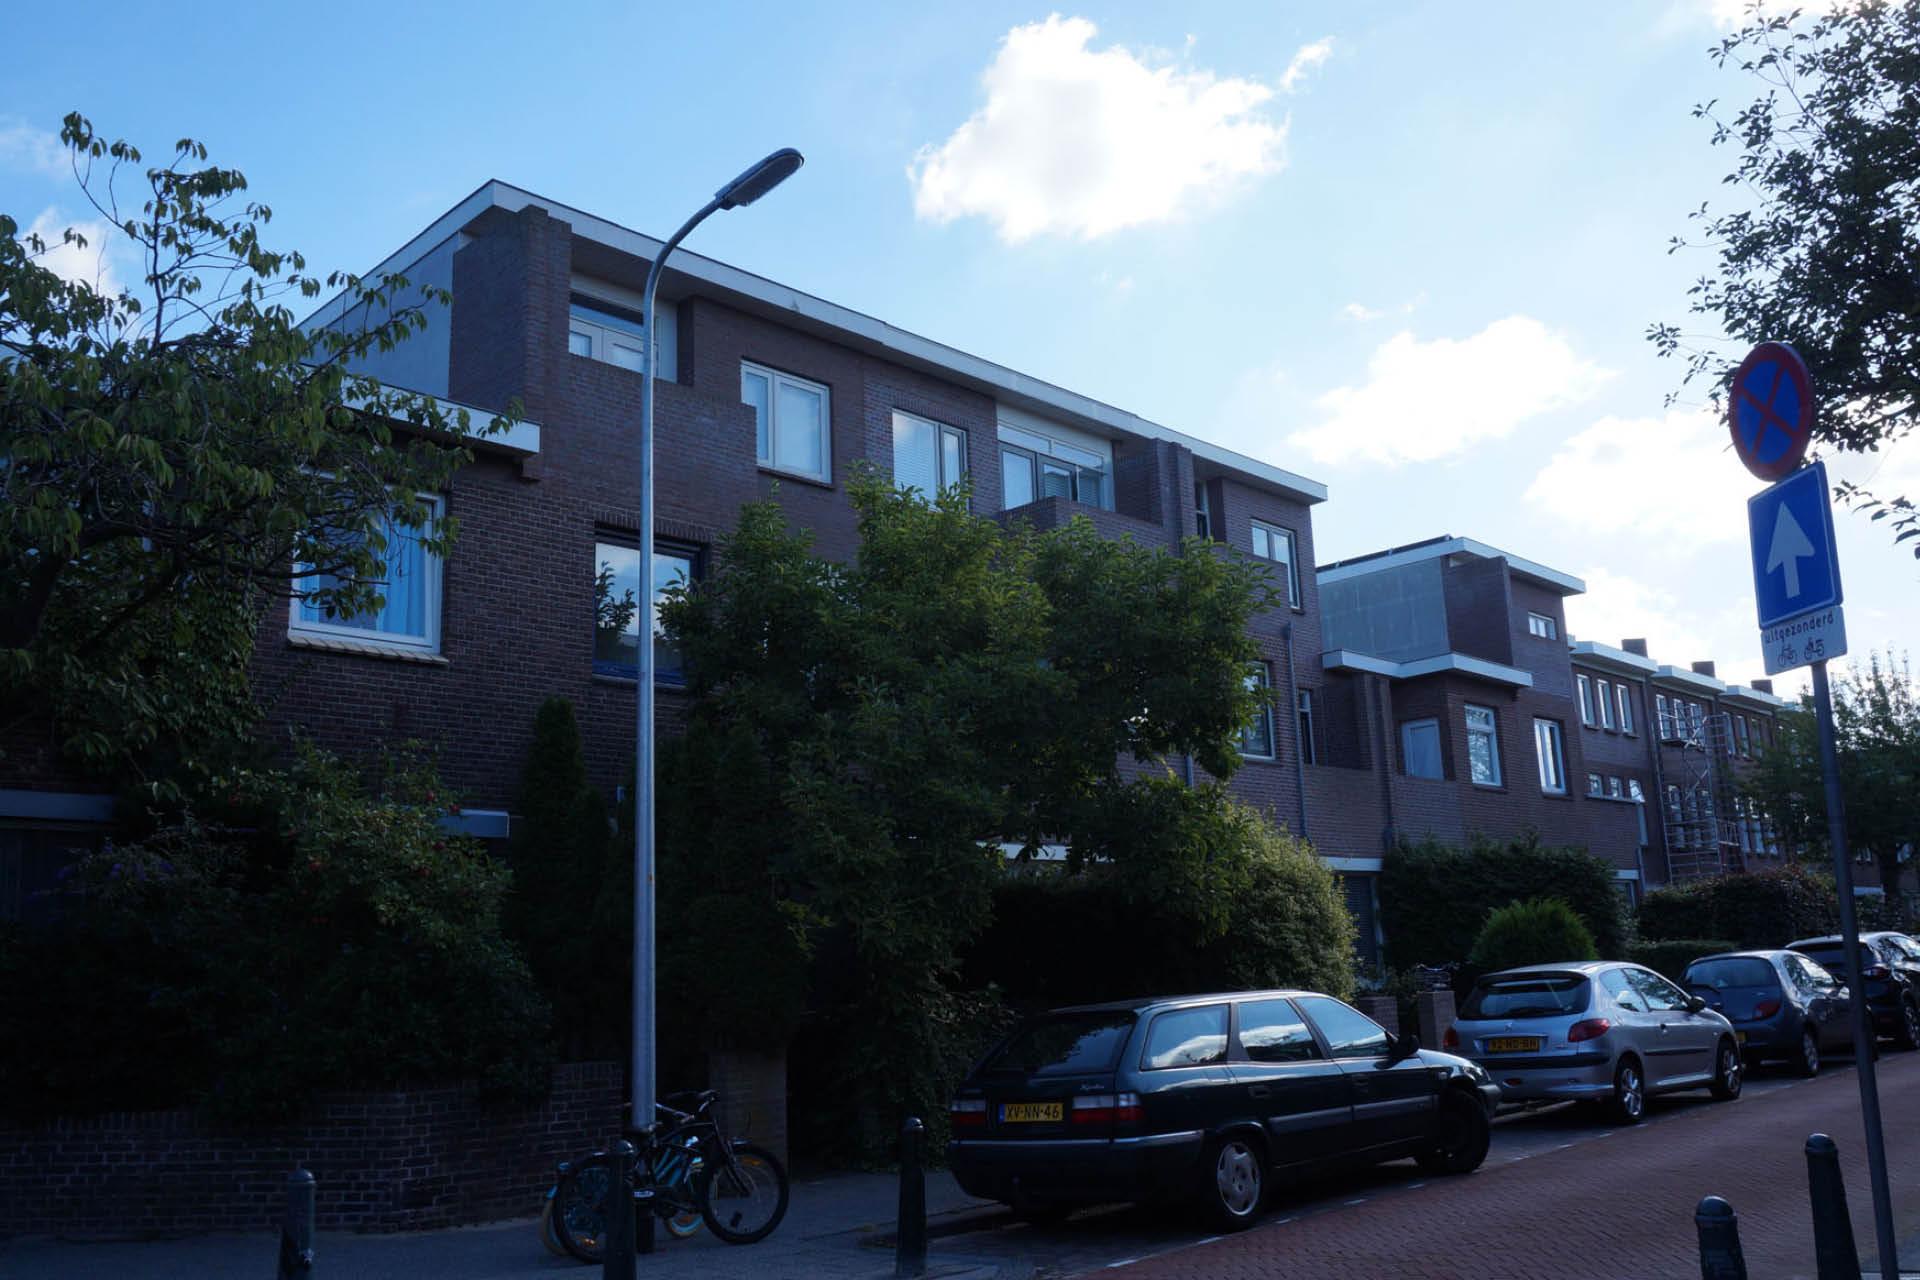 Fuchsiastraat, Kamillestraat & Hyacinthweg, Den Haag